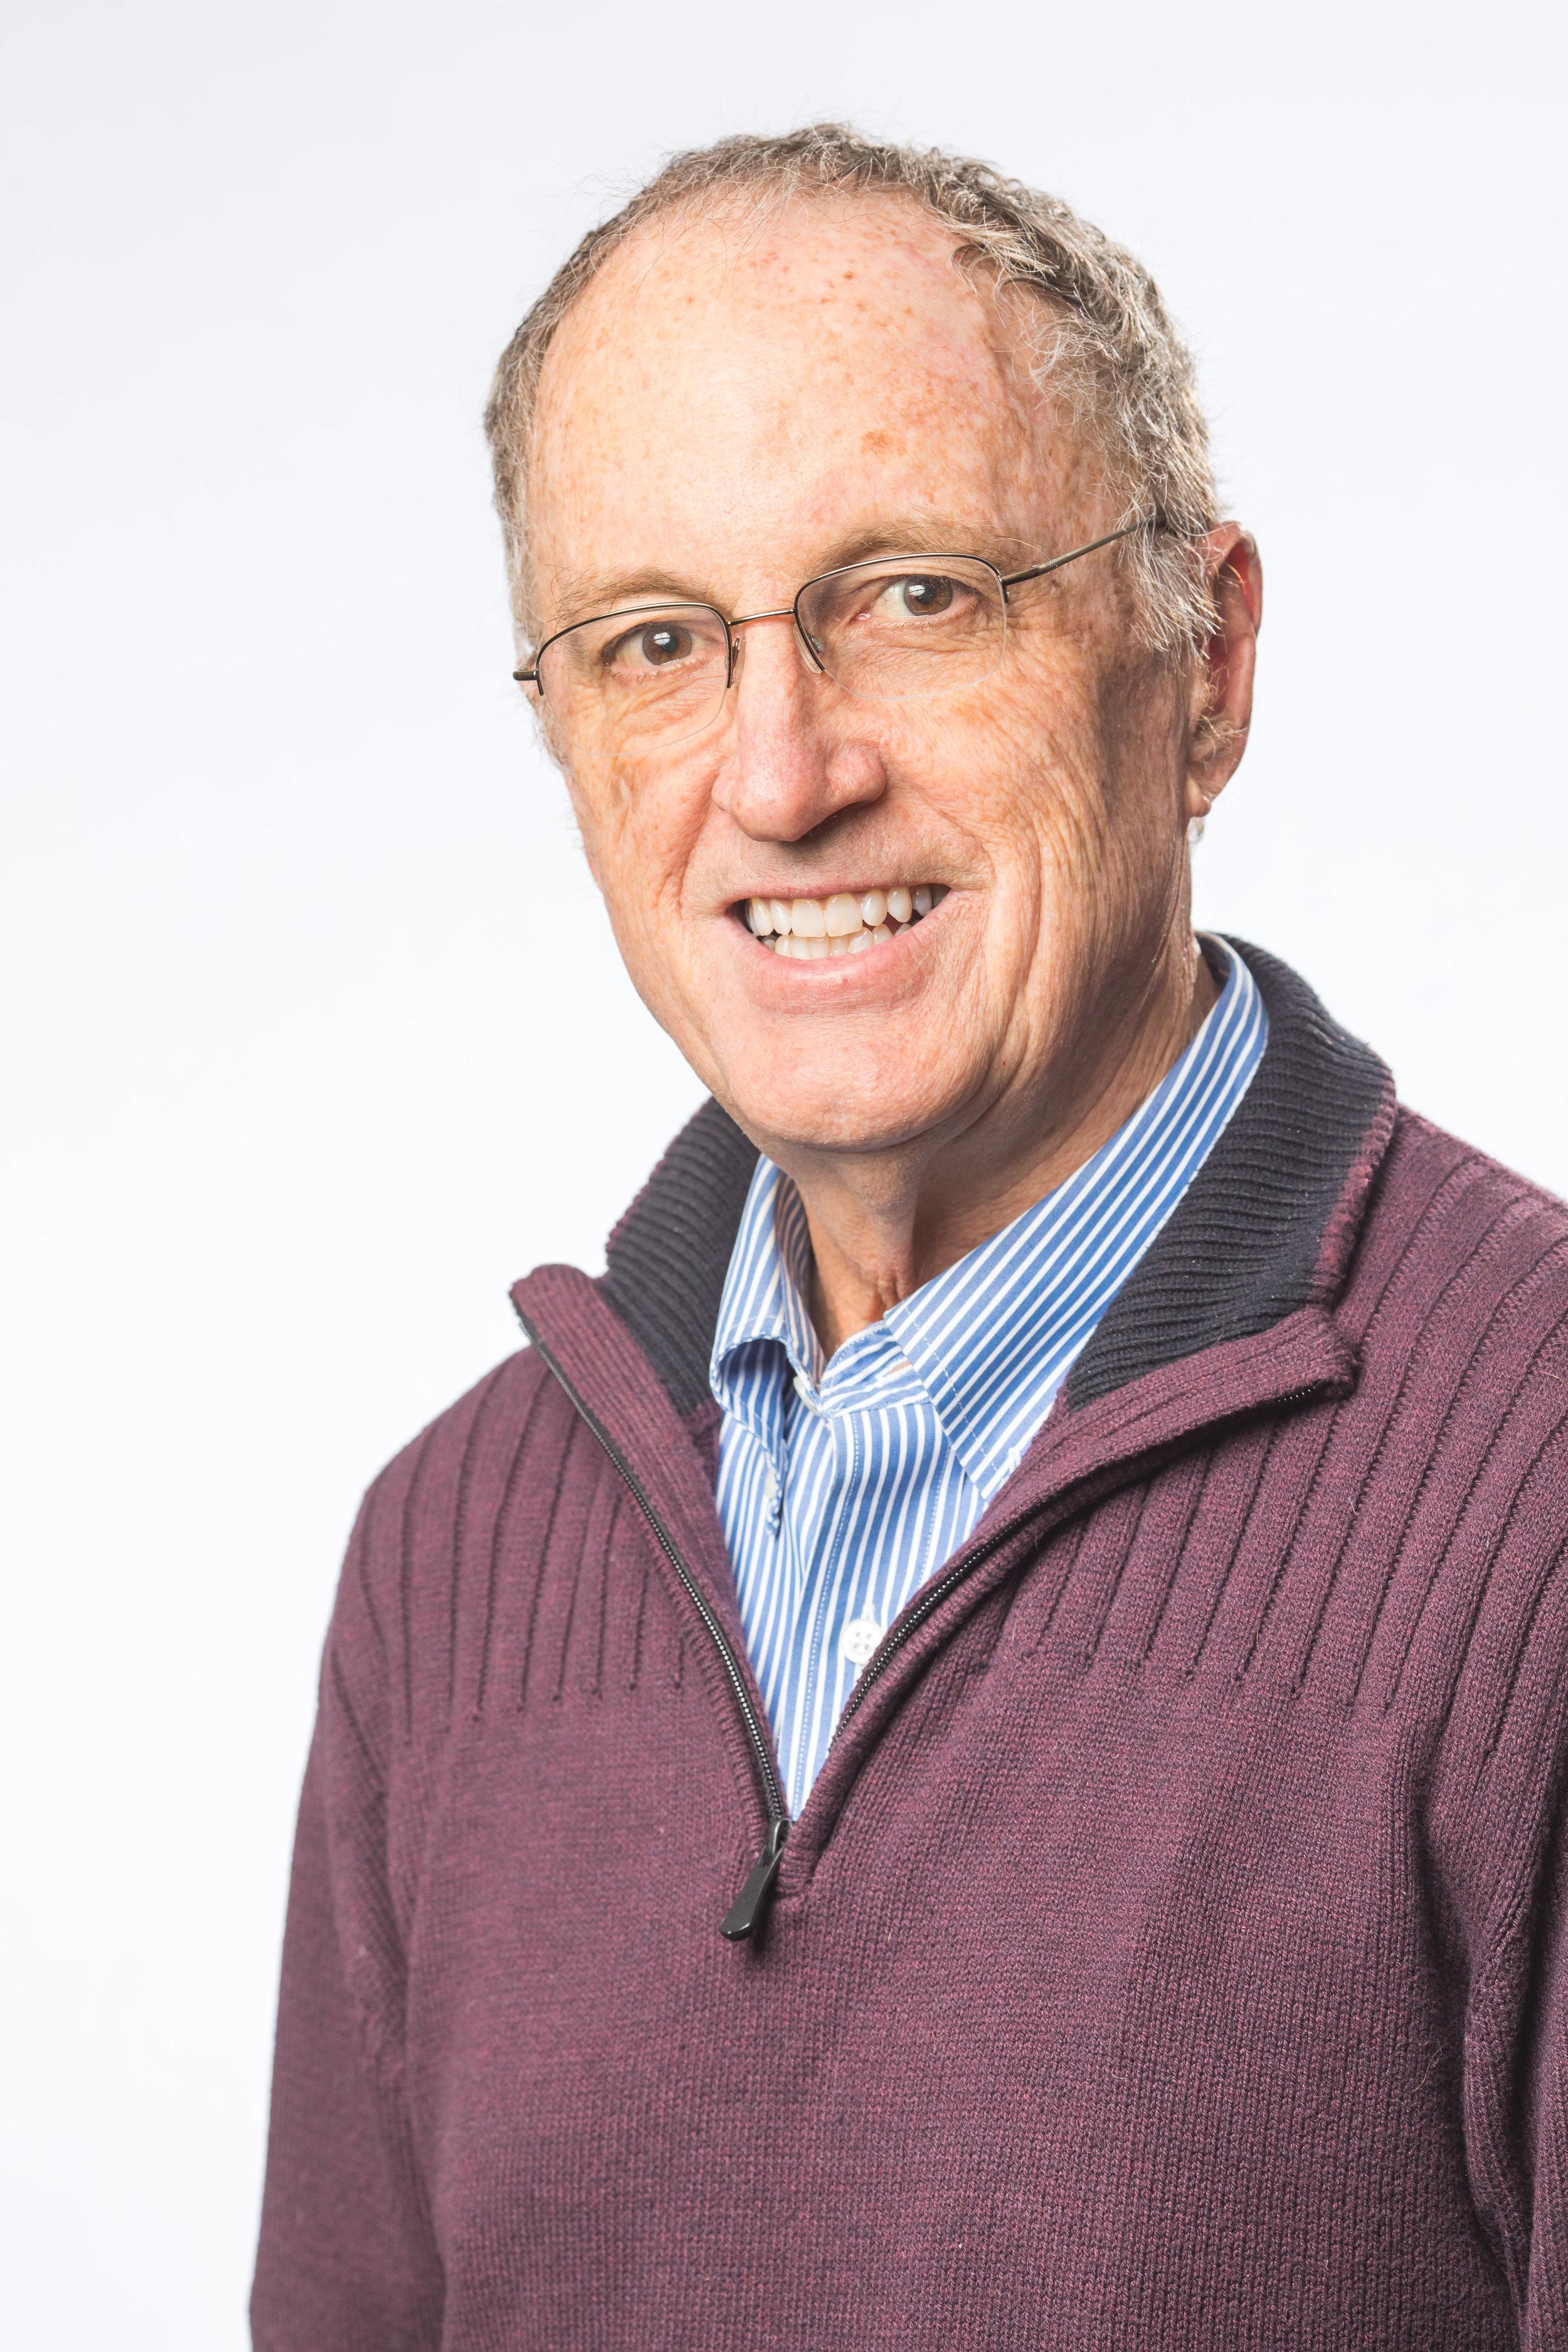 Greg Brown, Director